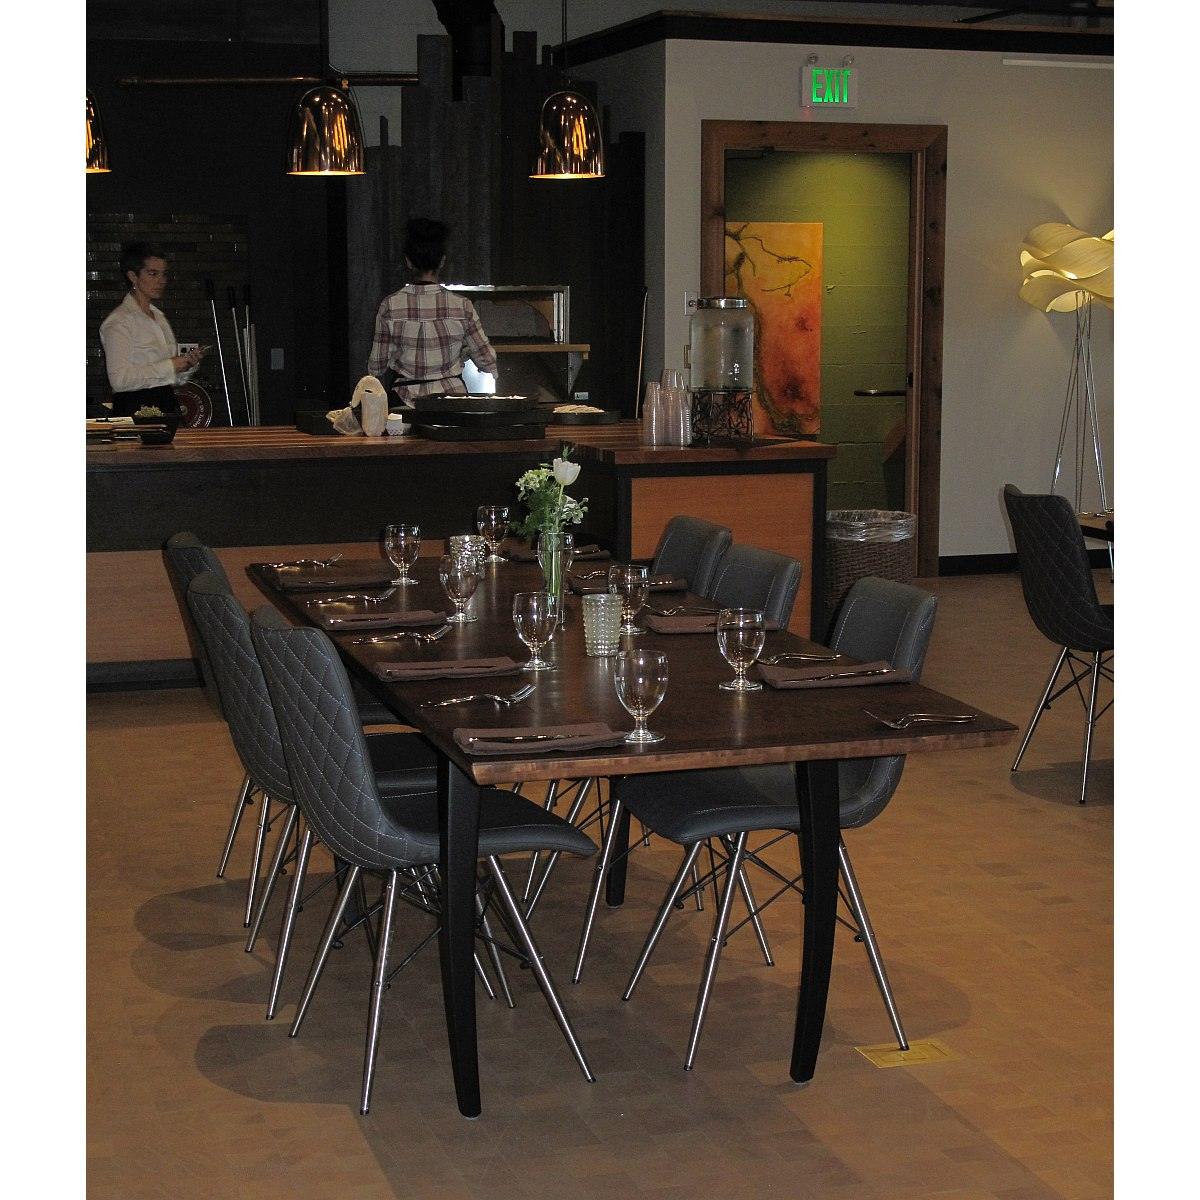 Banquet Dining Table: Banquet Dining Table